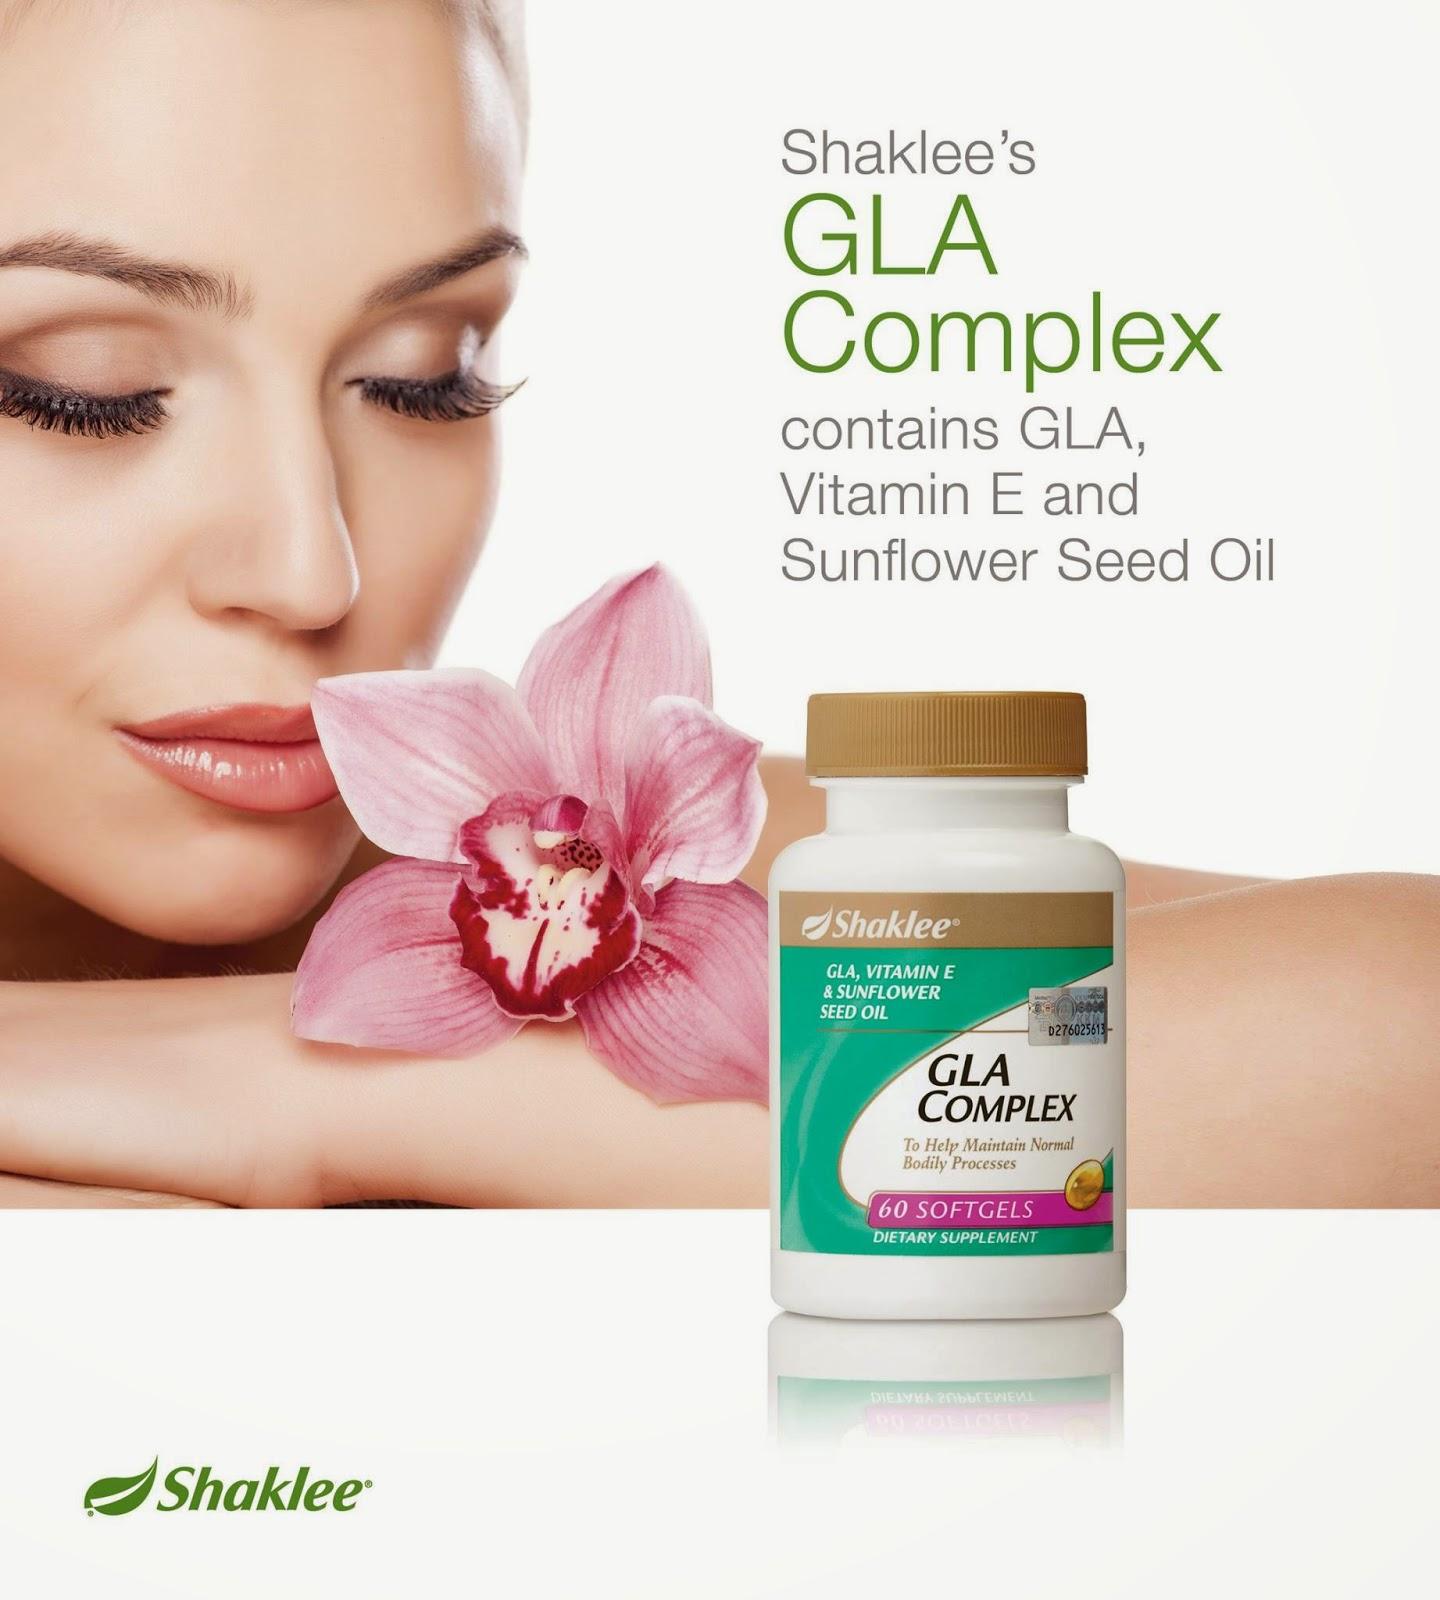 Kandungan GLA Complex shaklee